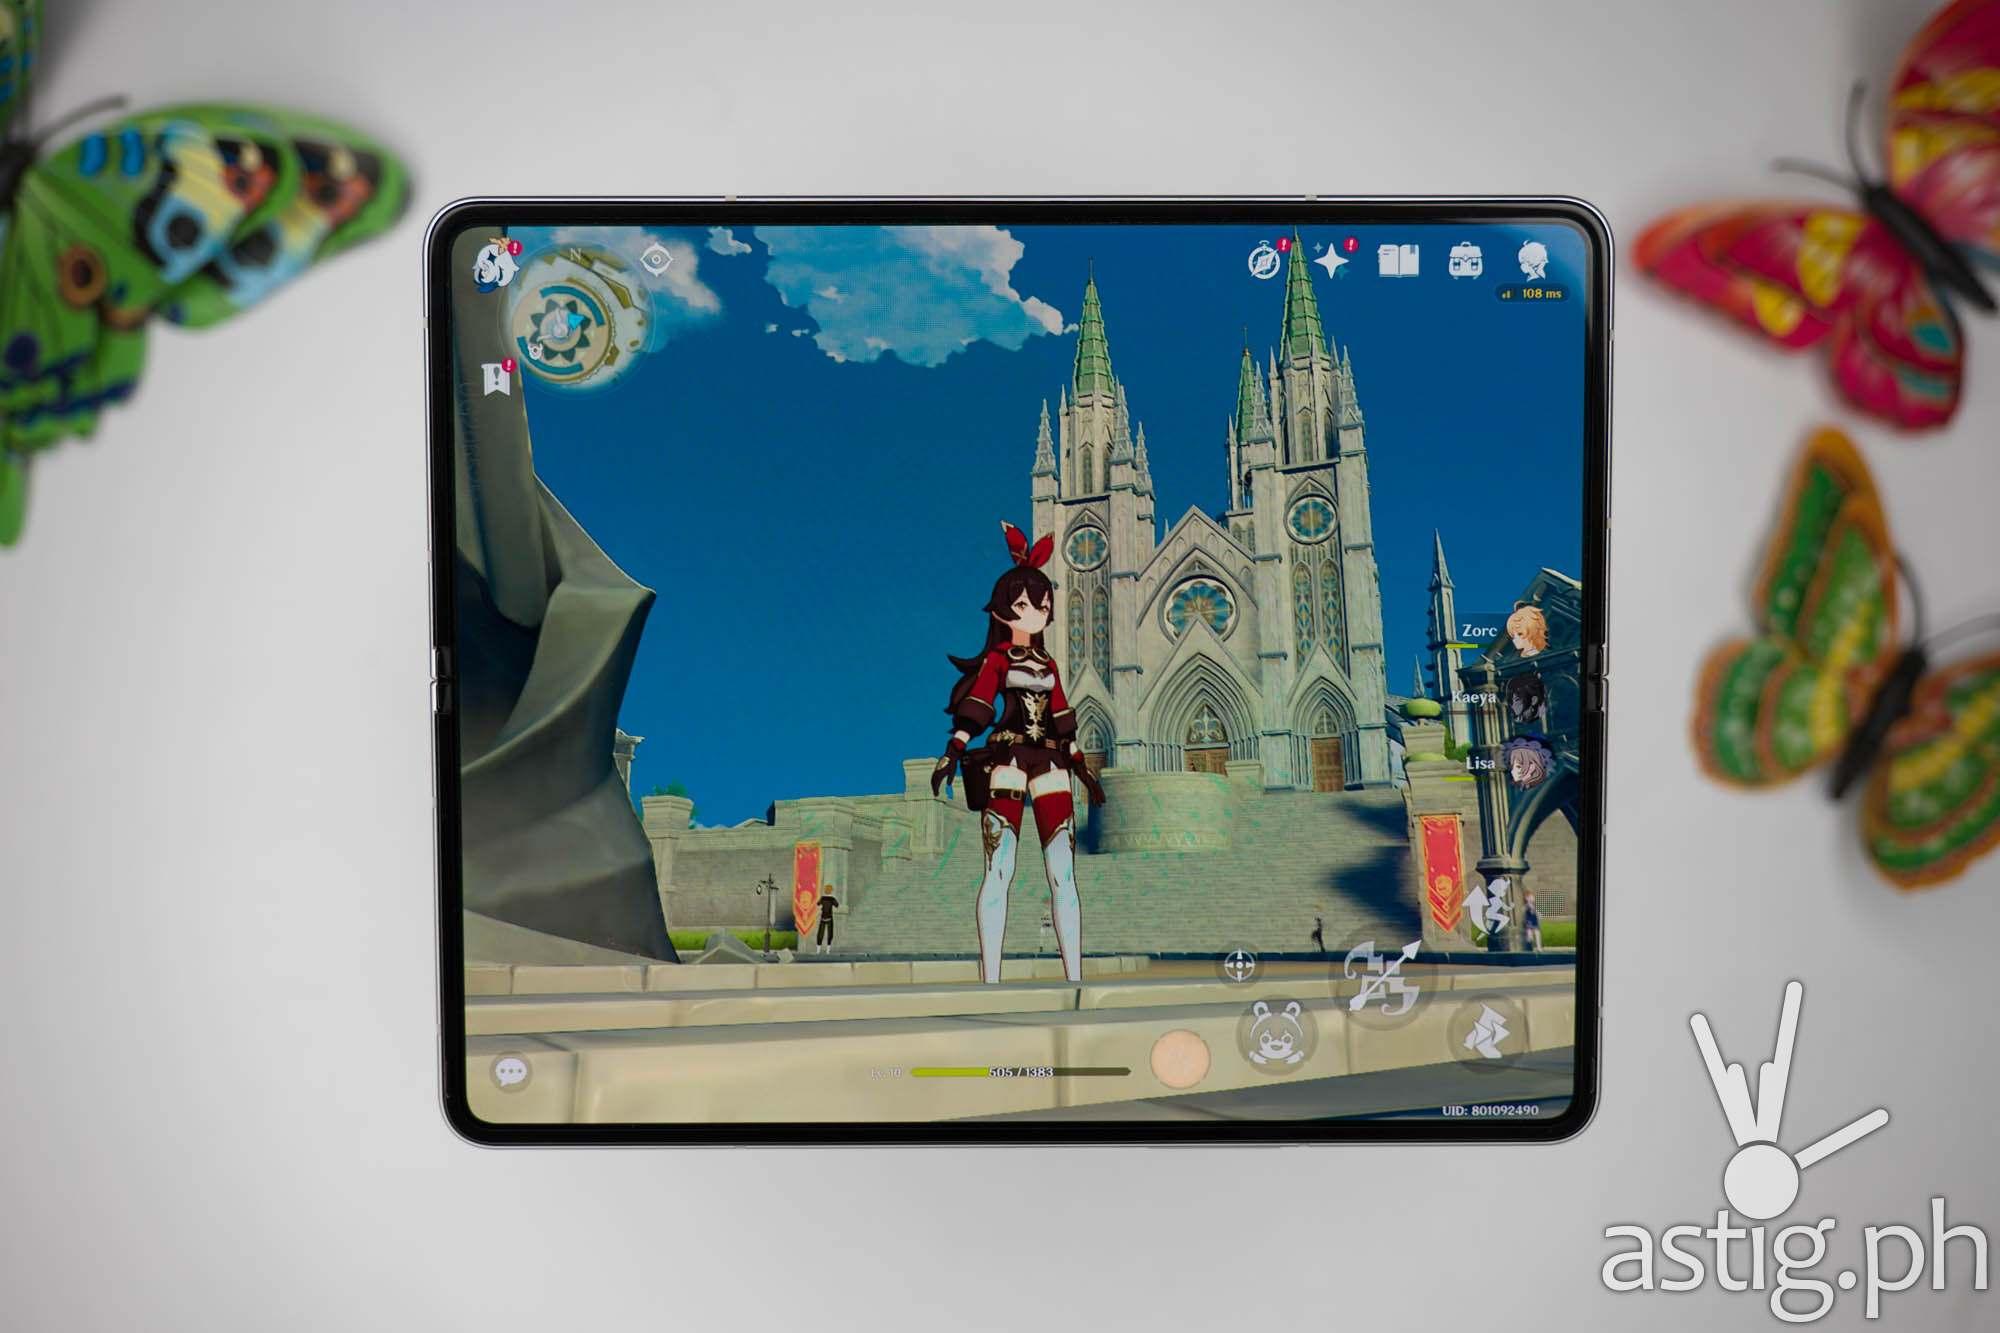 Genshin Impact - SAMSUNG Galaxy Z Fold3 5G (Philippines)